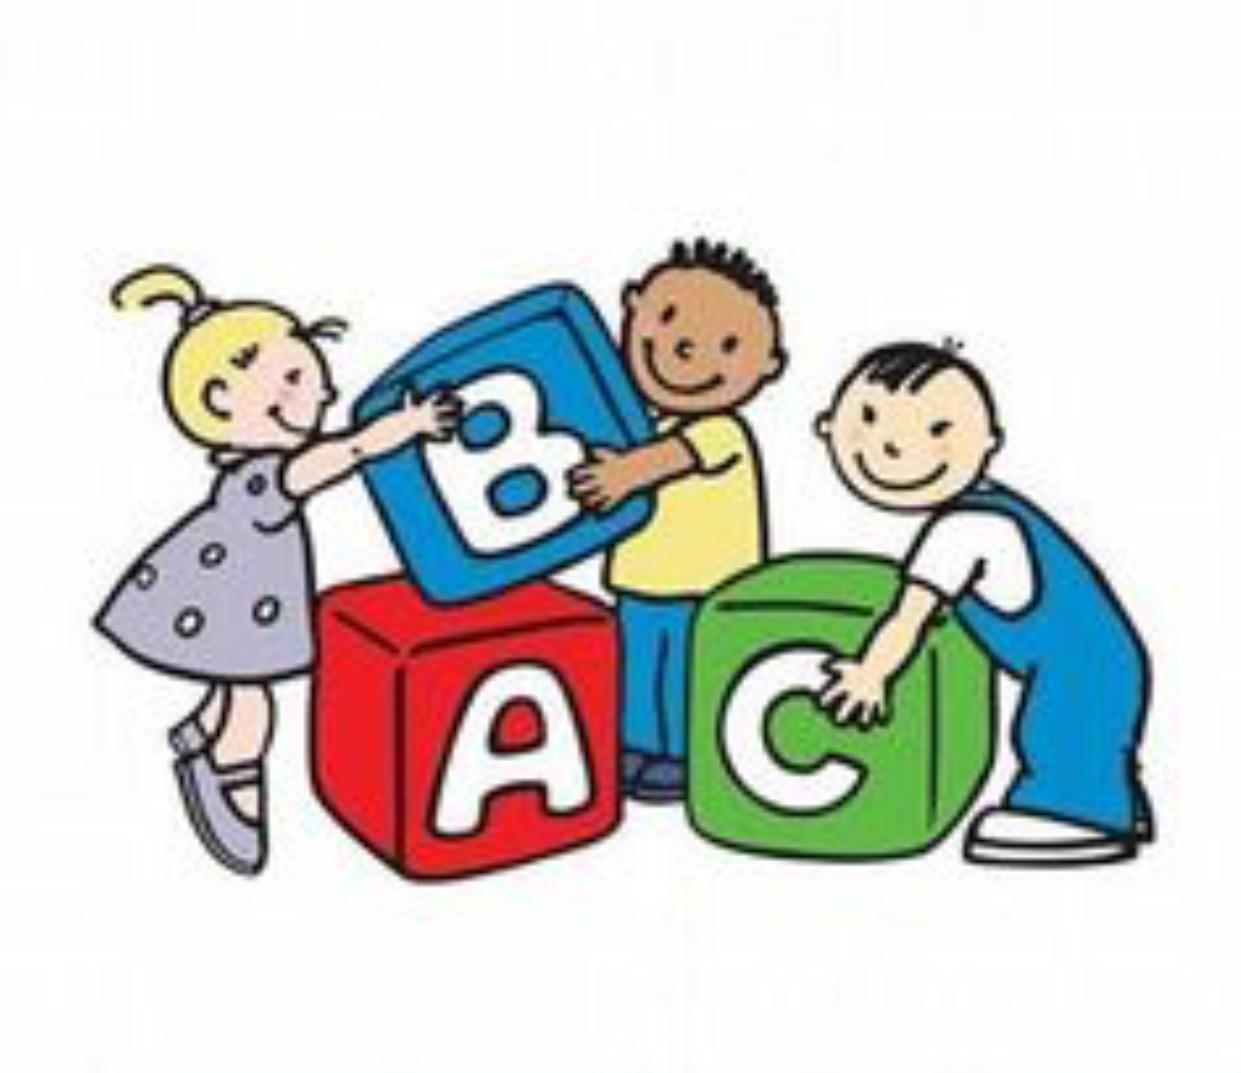 Little champions spanaway wa. Alphabet clipart child care provider